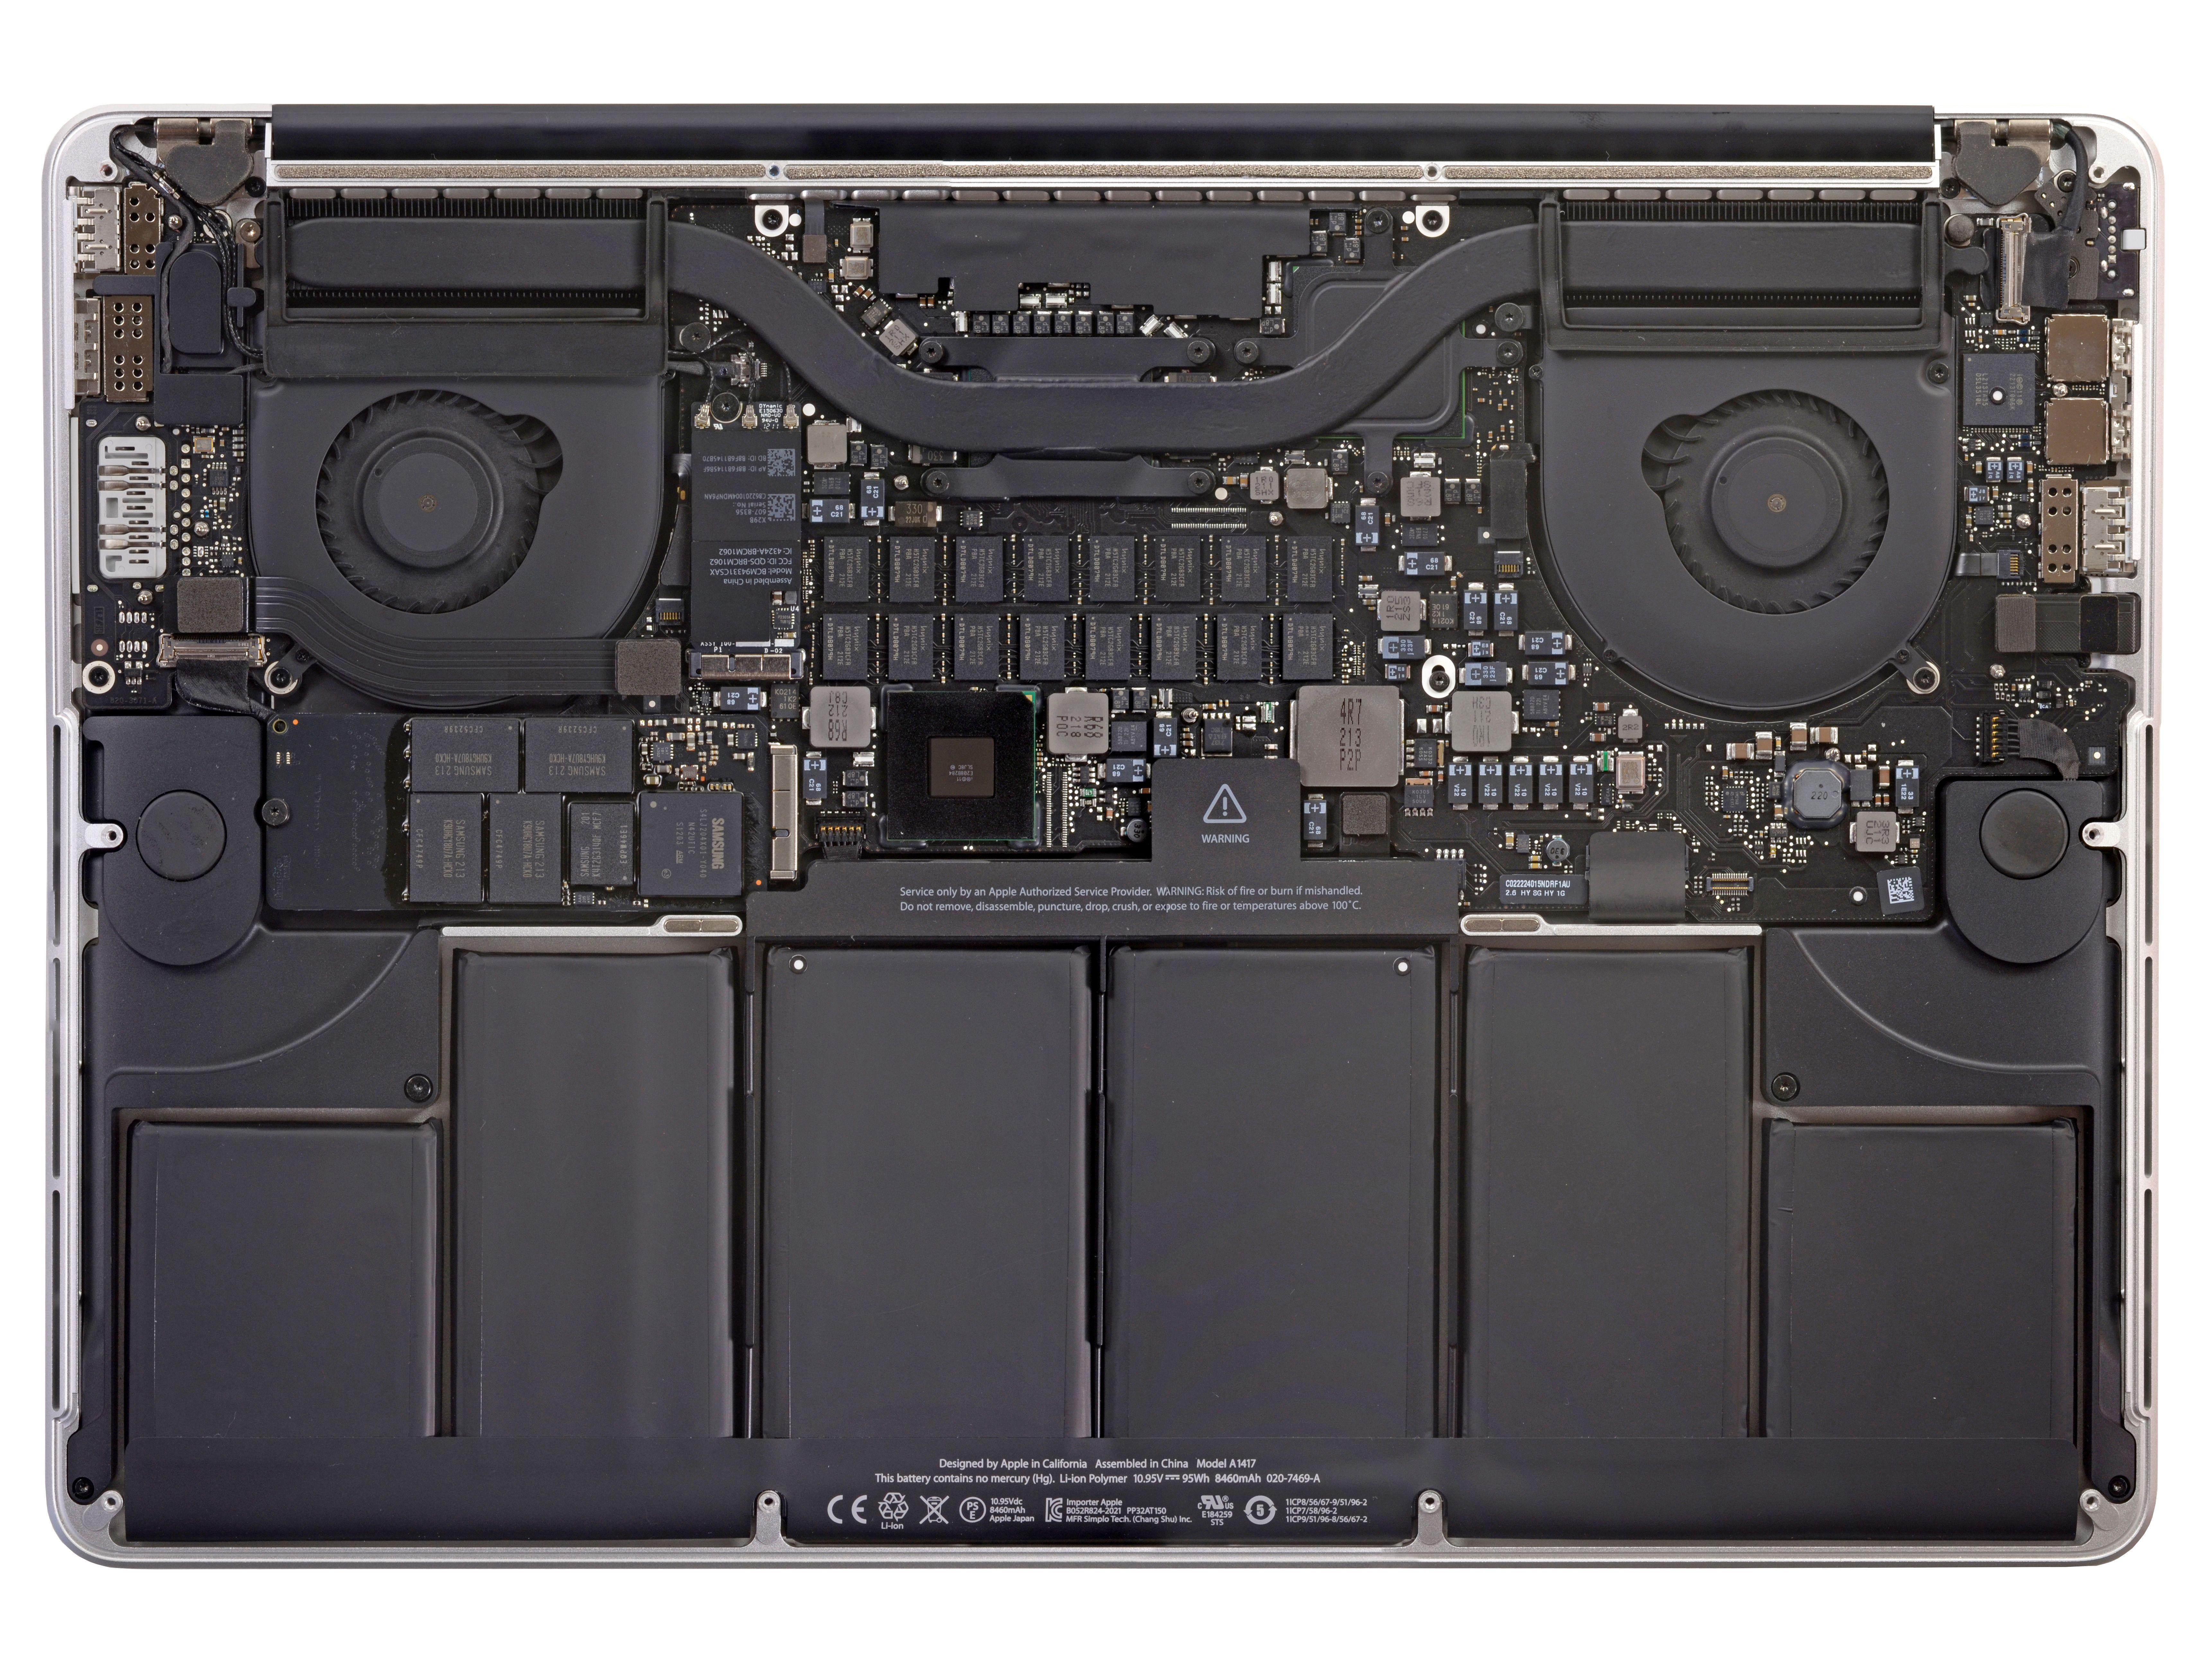 Interior Of The Macbook Pro 15 With Retina Display Newest Macbook Pro Macbook Pro Macbook Pro Retina